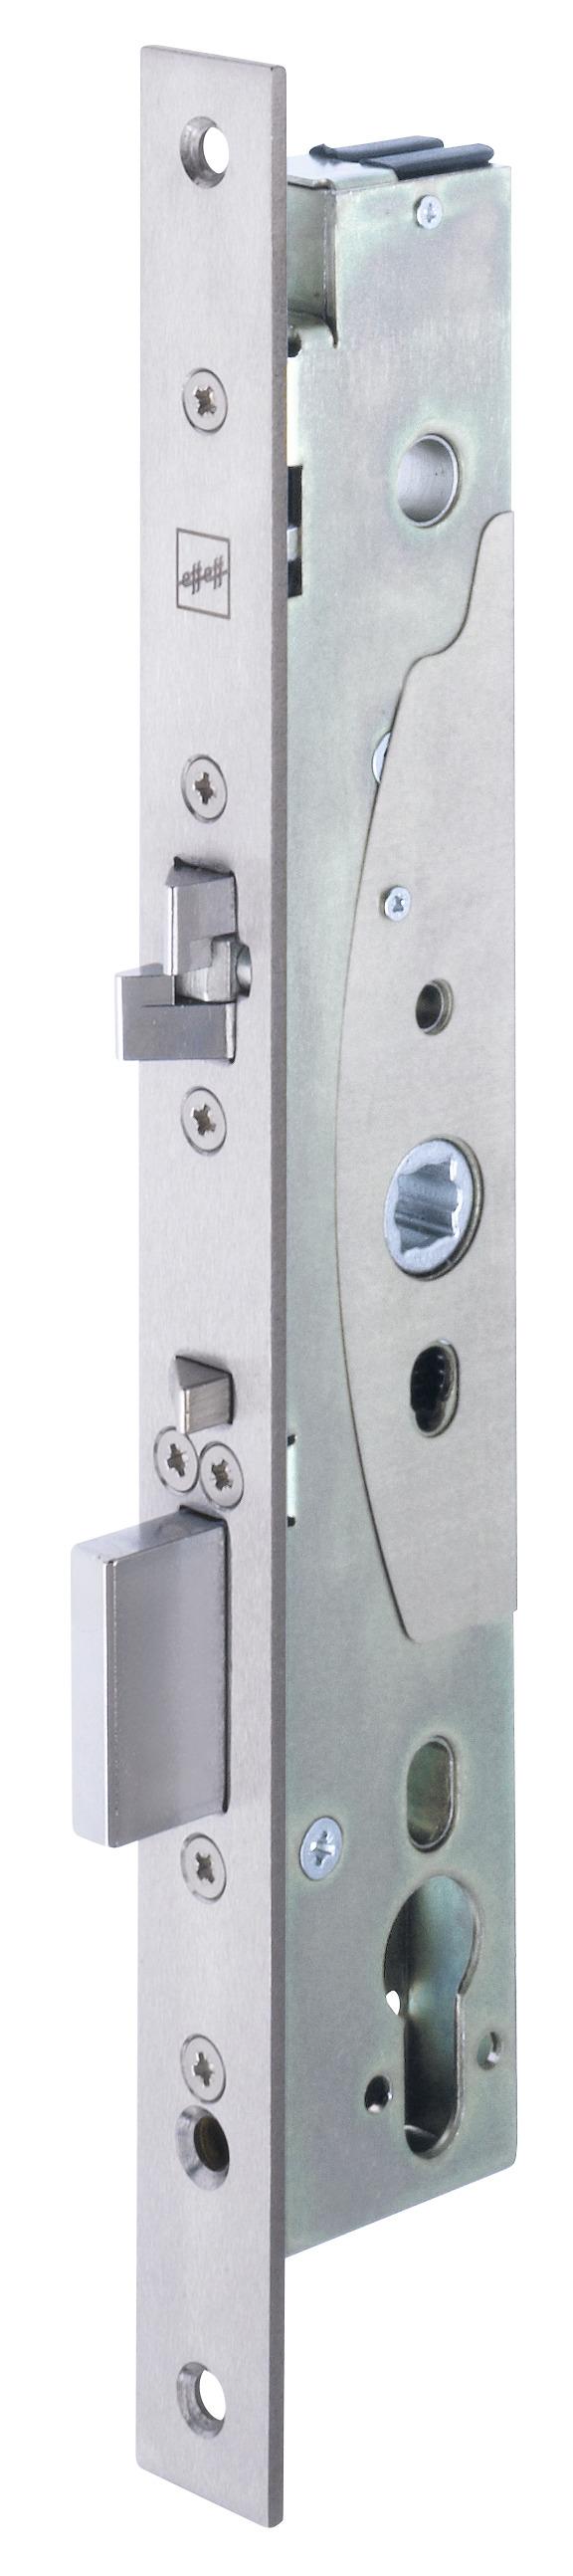 sicherheitsschloss mit externer steuerung sicherheitsschloss motorausf hrung rohrrahmen. Black Bedroom Furniture Sets. Home Design Ideas